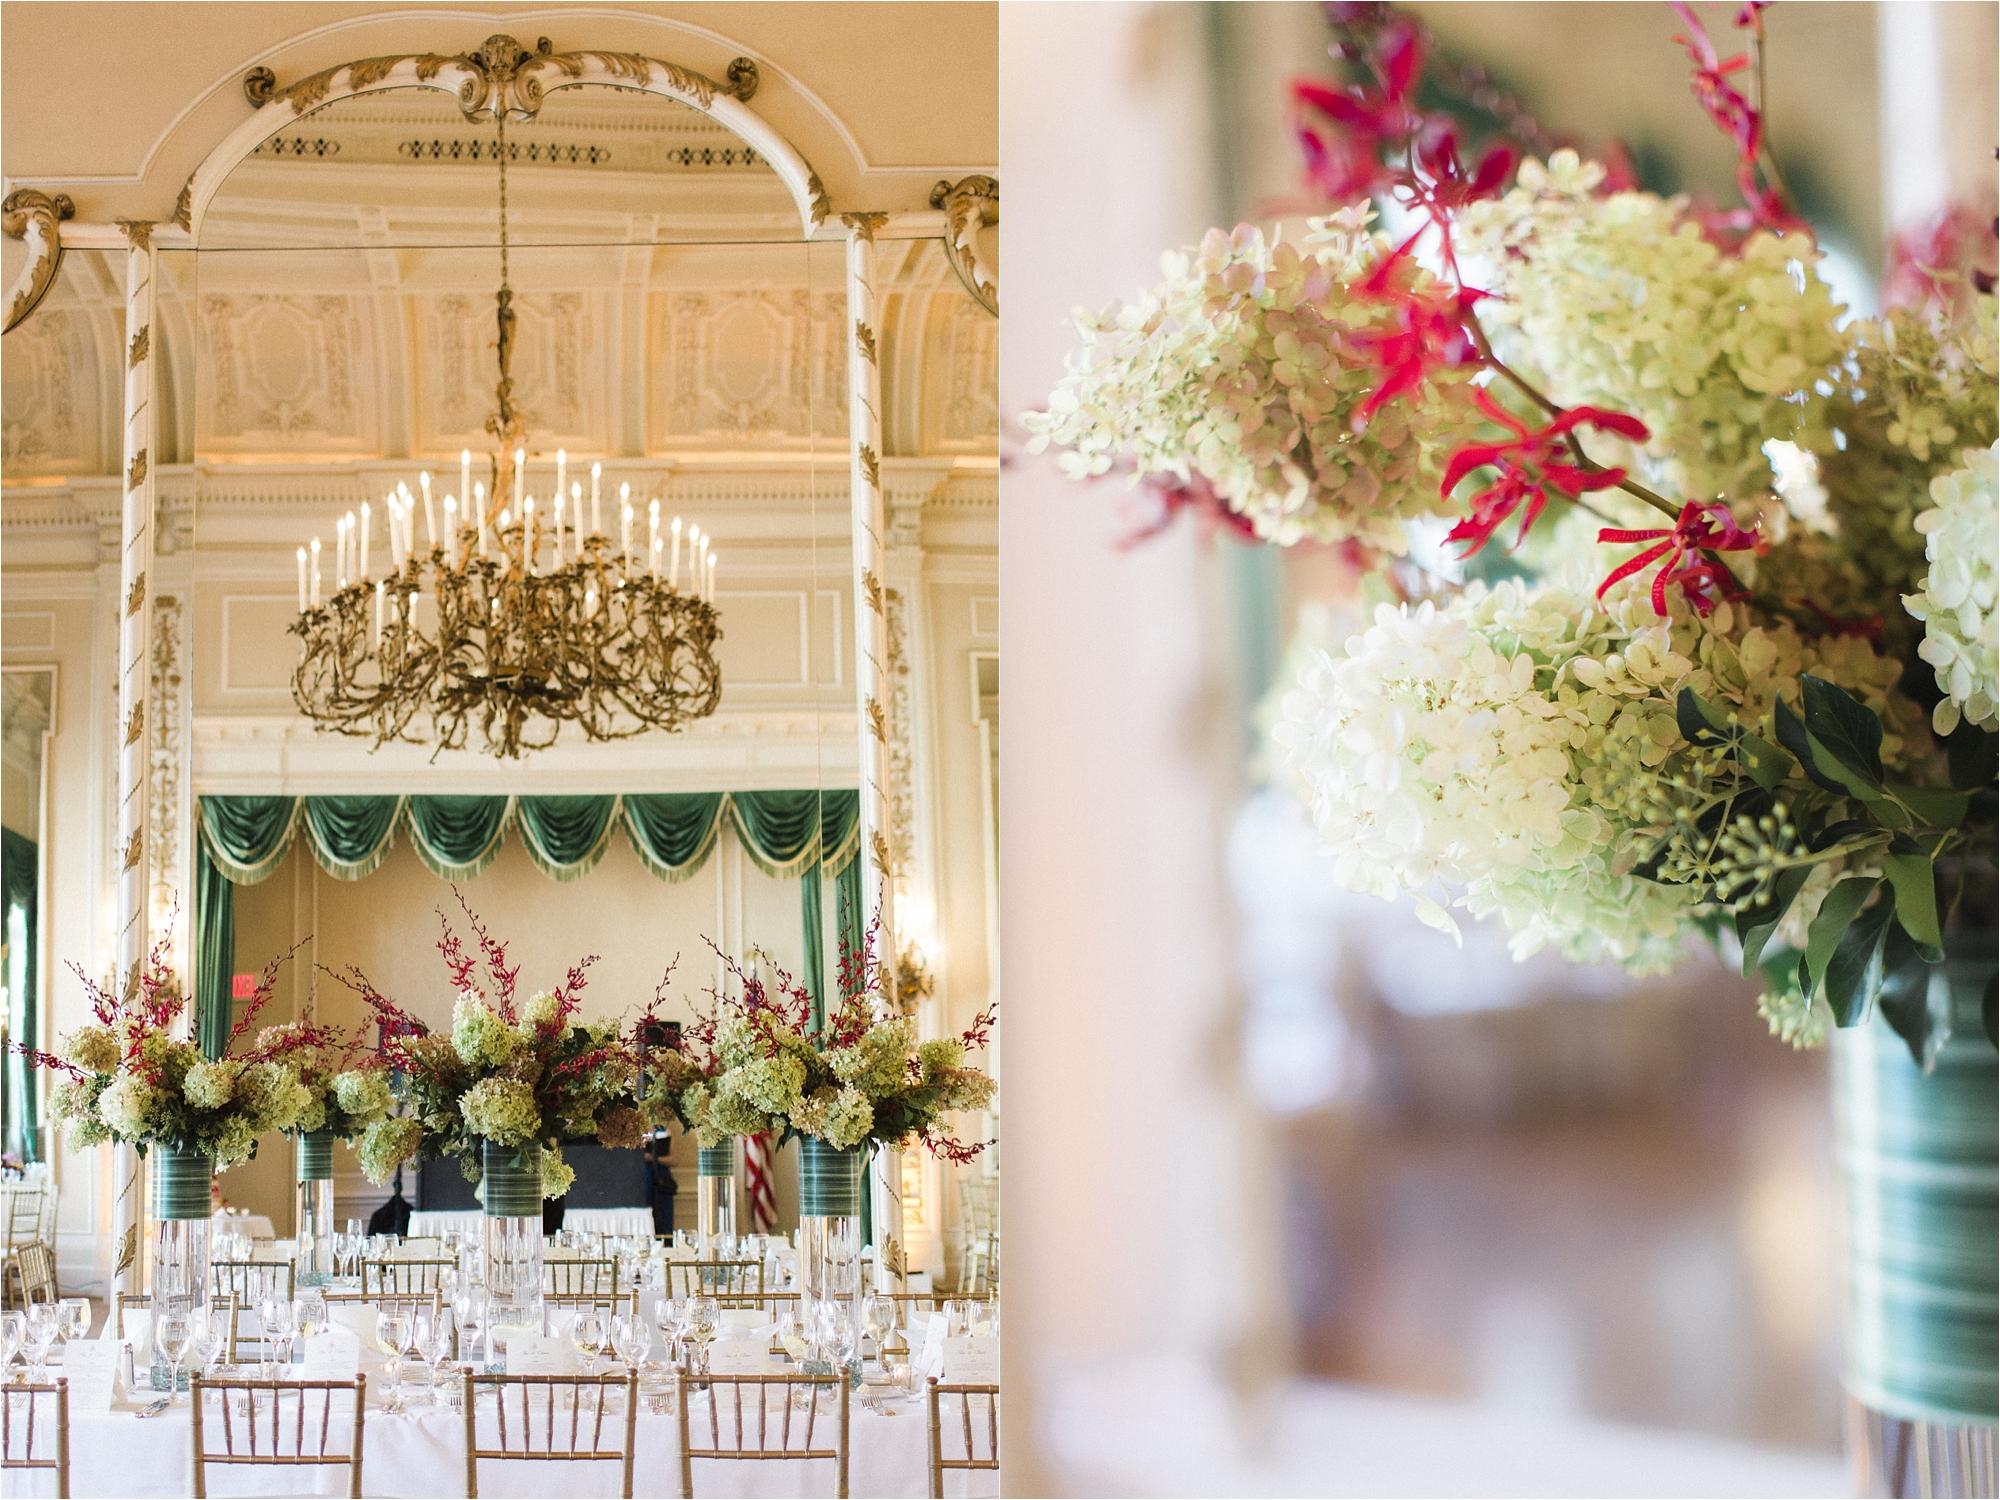 stephanie-yonce-photography-elegant-private-club-washington-dc-wedding-photos_0030.jpg